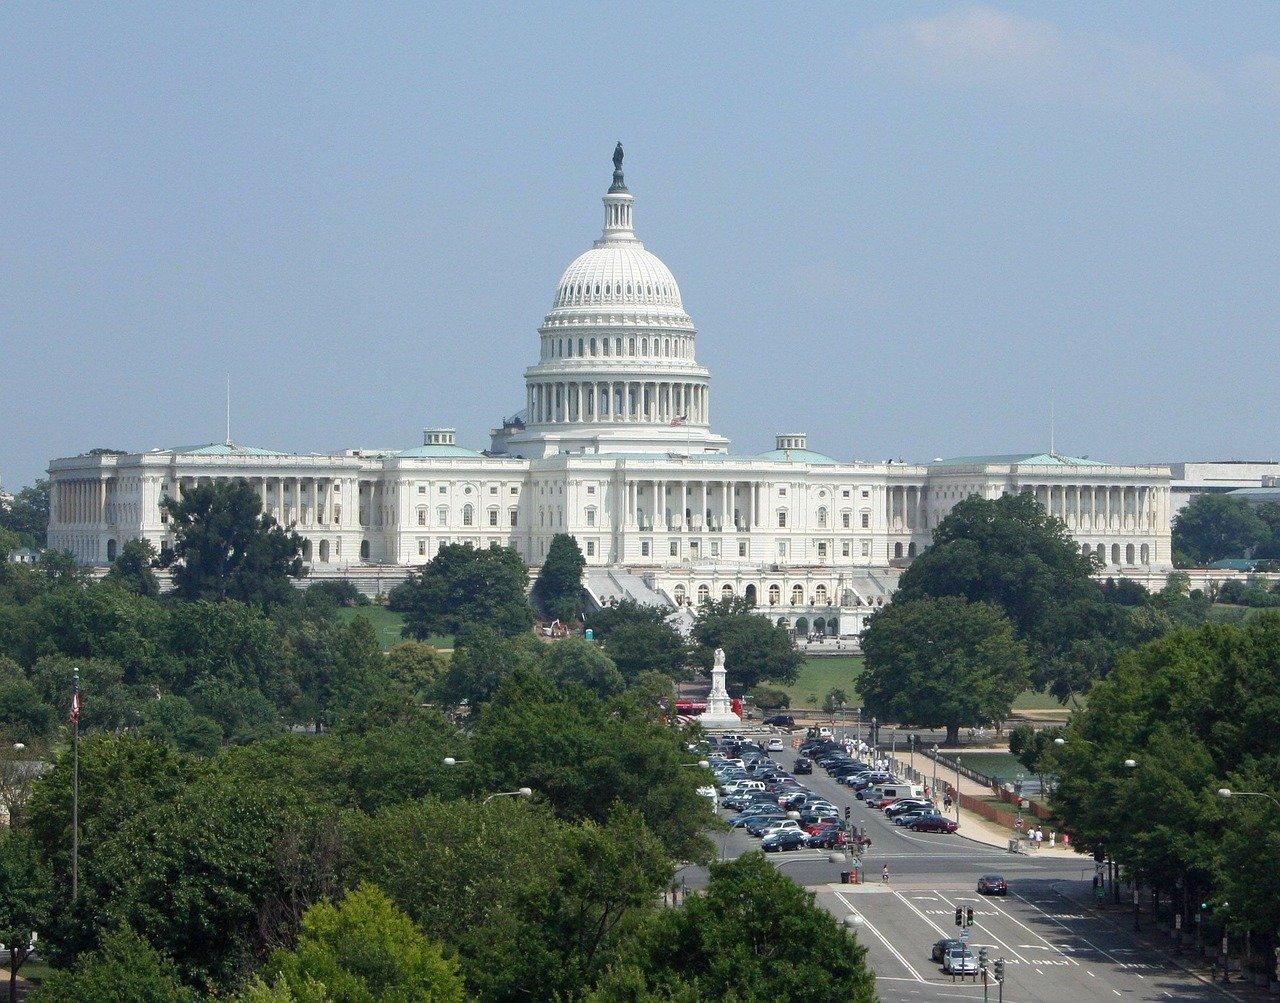 Legal scholars urge Senate to reject Trump First Amendment impeachment defense